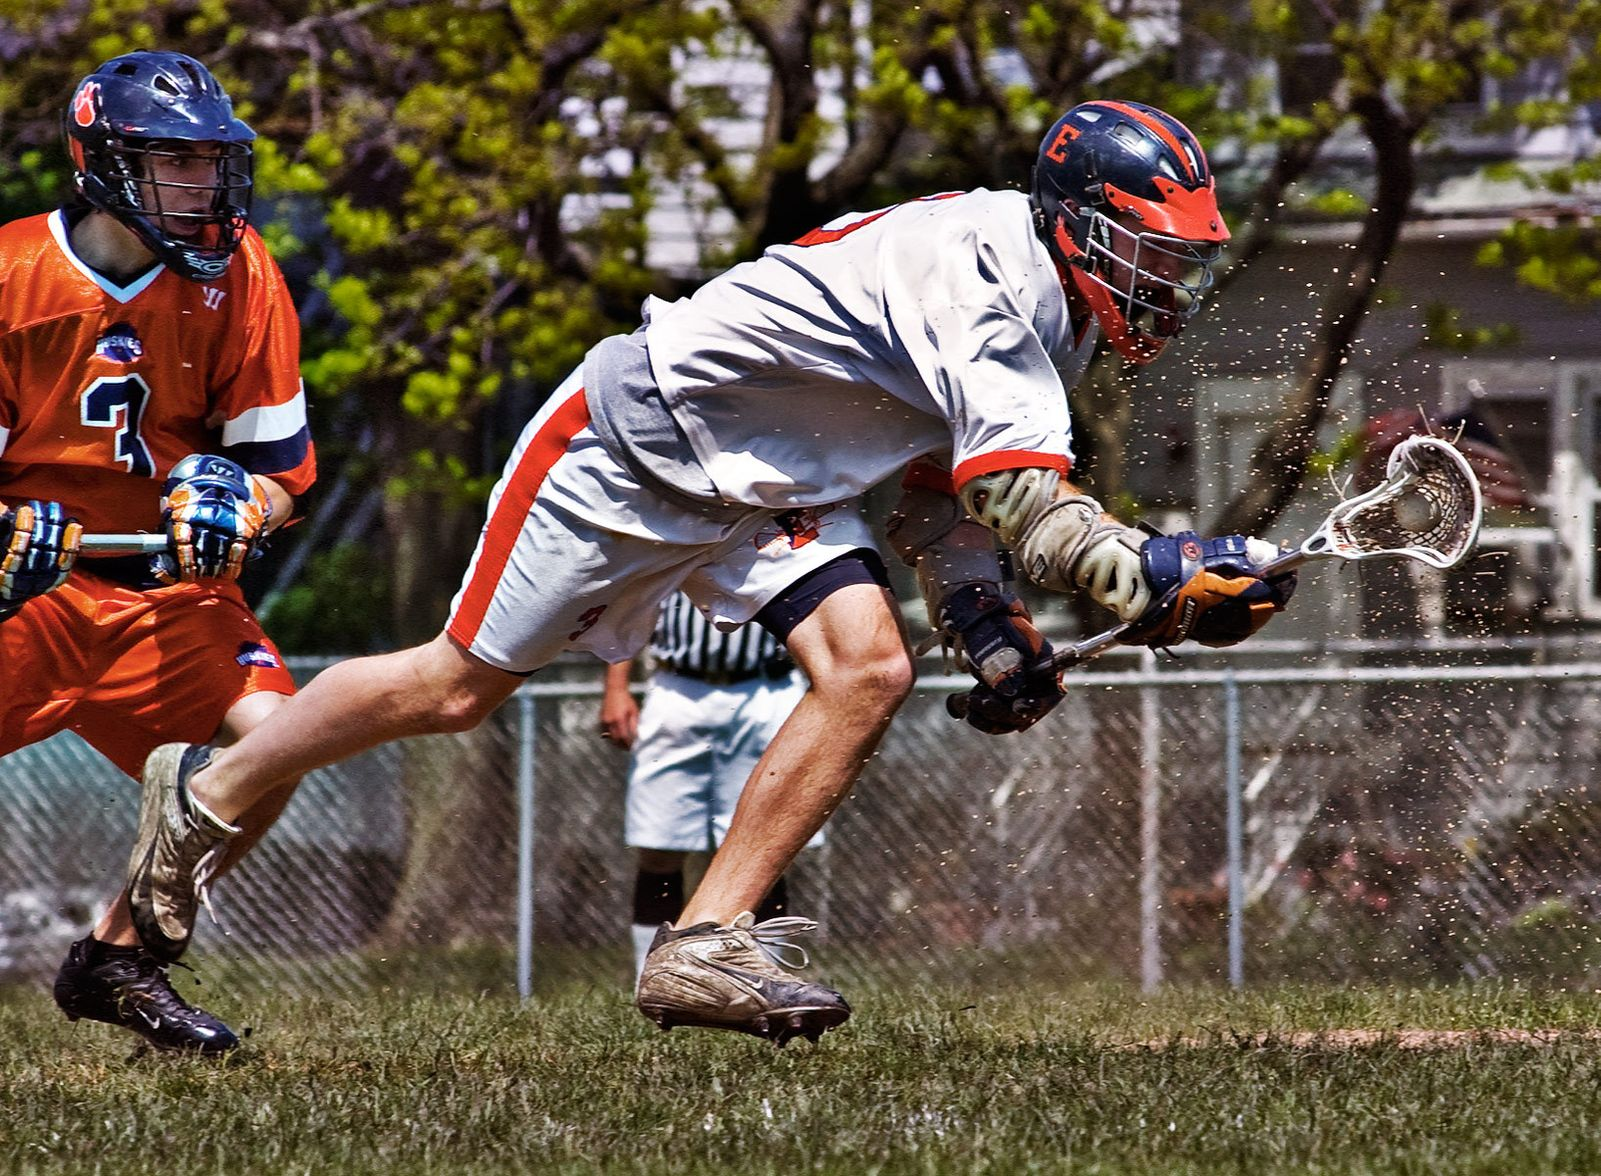 1evanston_lacrosse